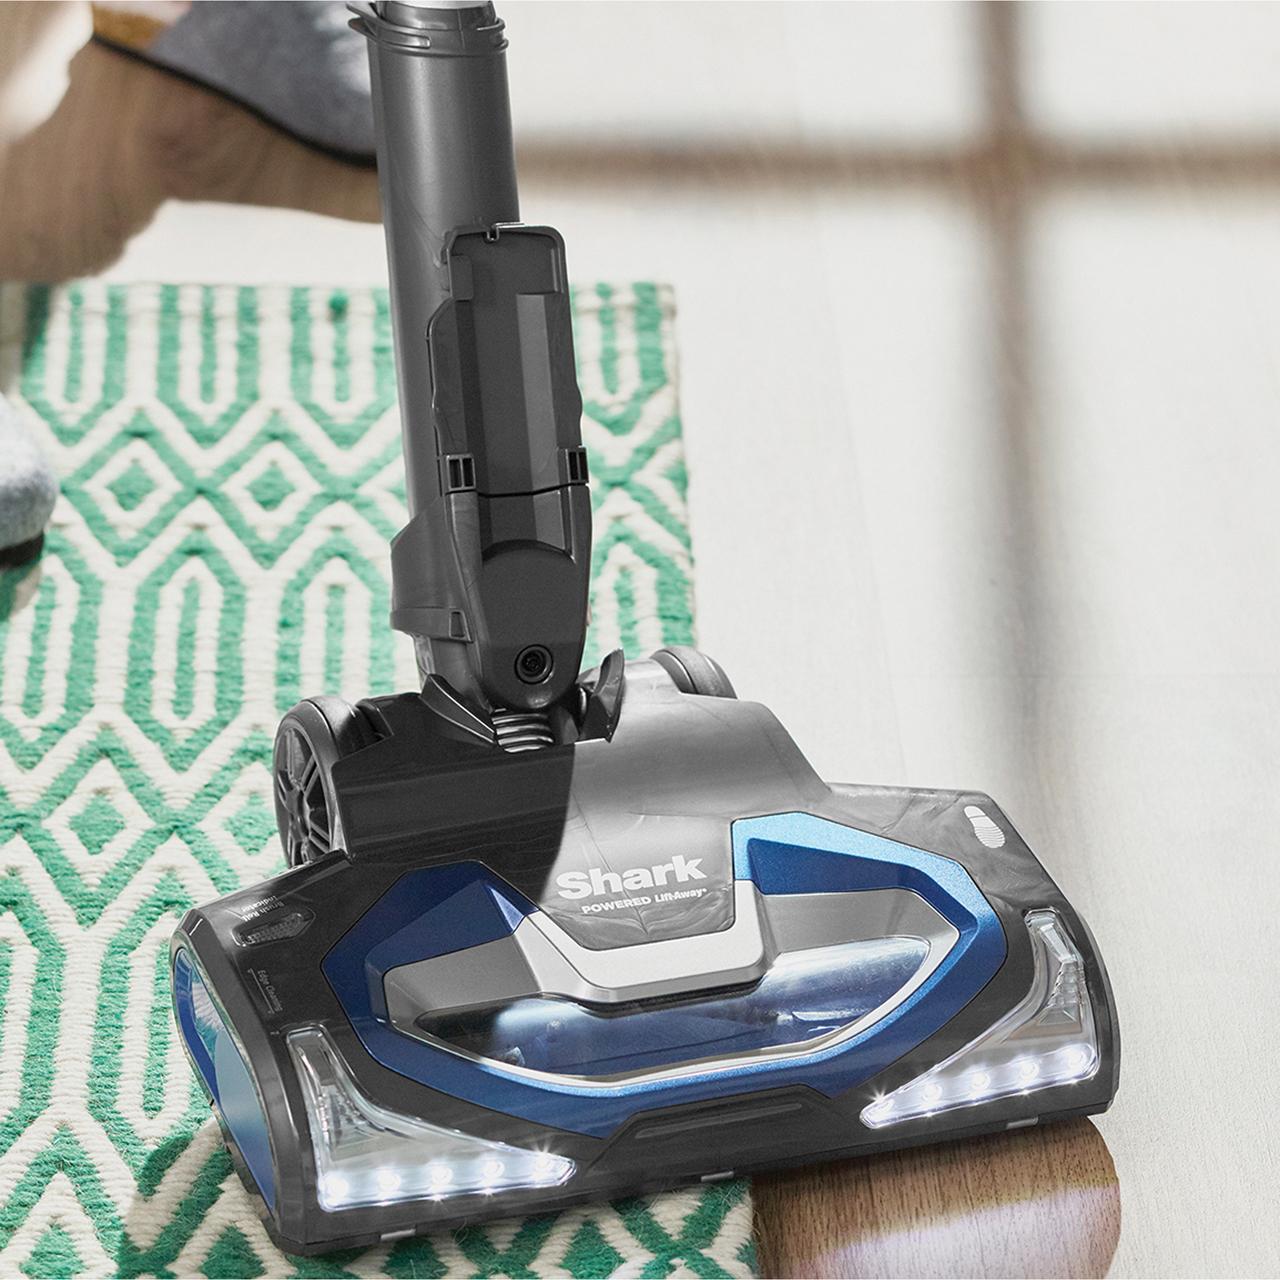 Shark Powered Lift Away Upright Vacuum Cleaner Hepa Filter Bagless Ebay